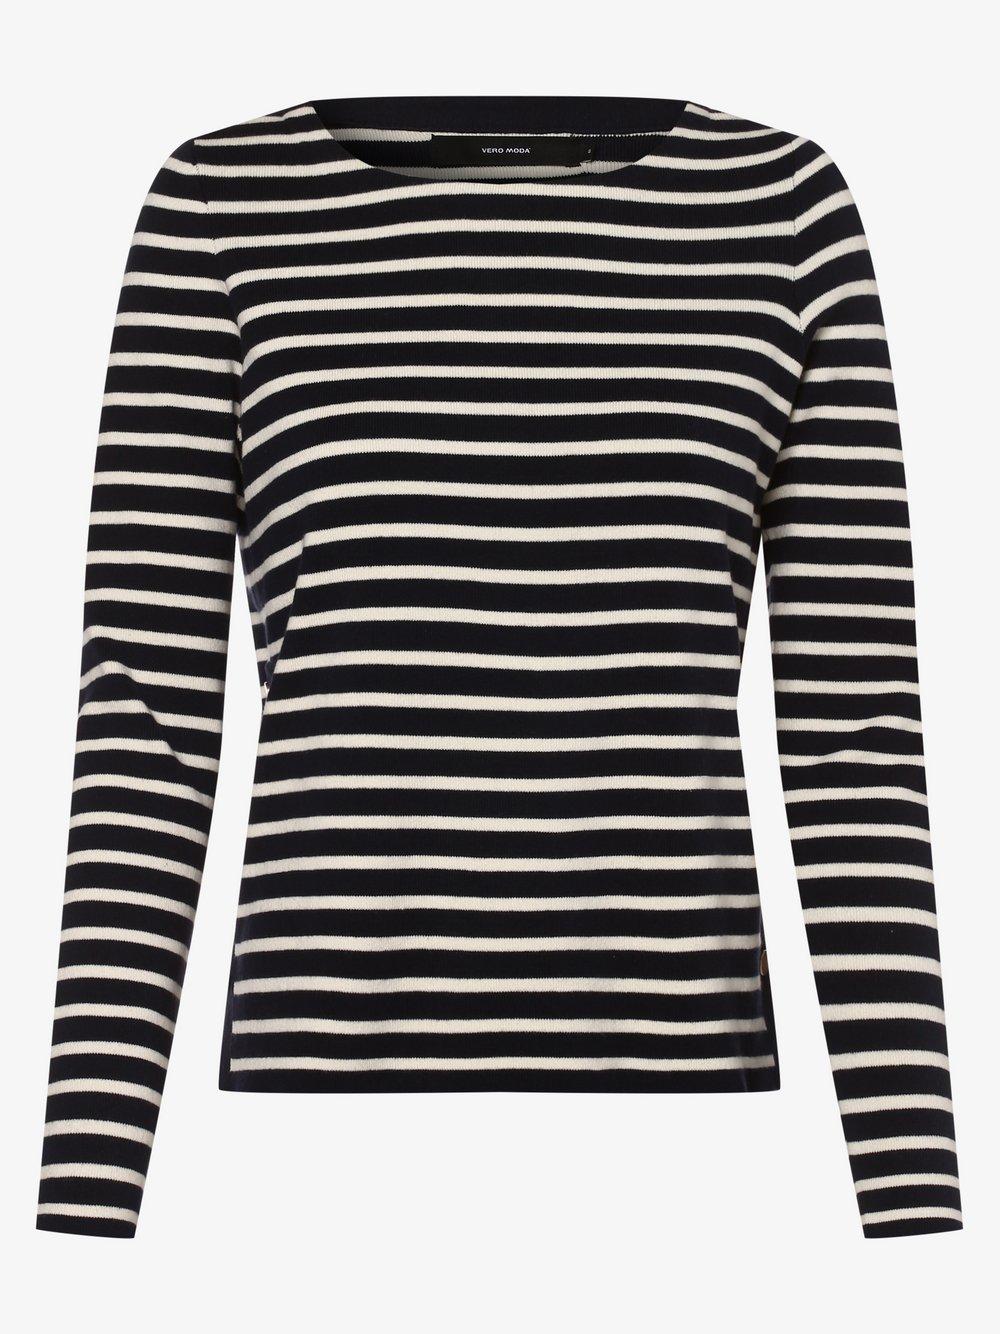 Vero Moda - Sweter damski – Vmsailor, niebieski